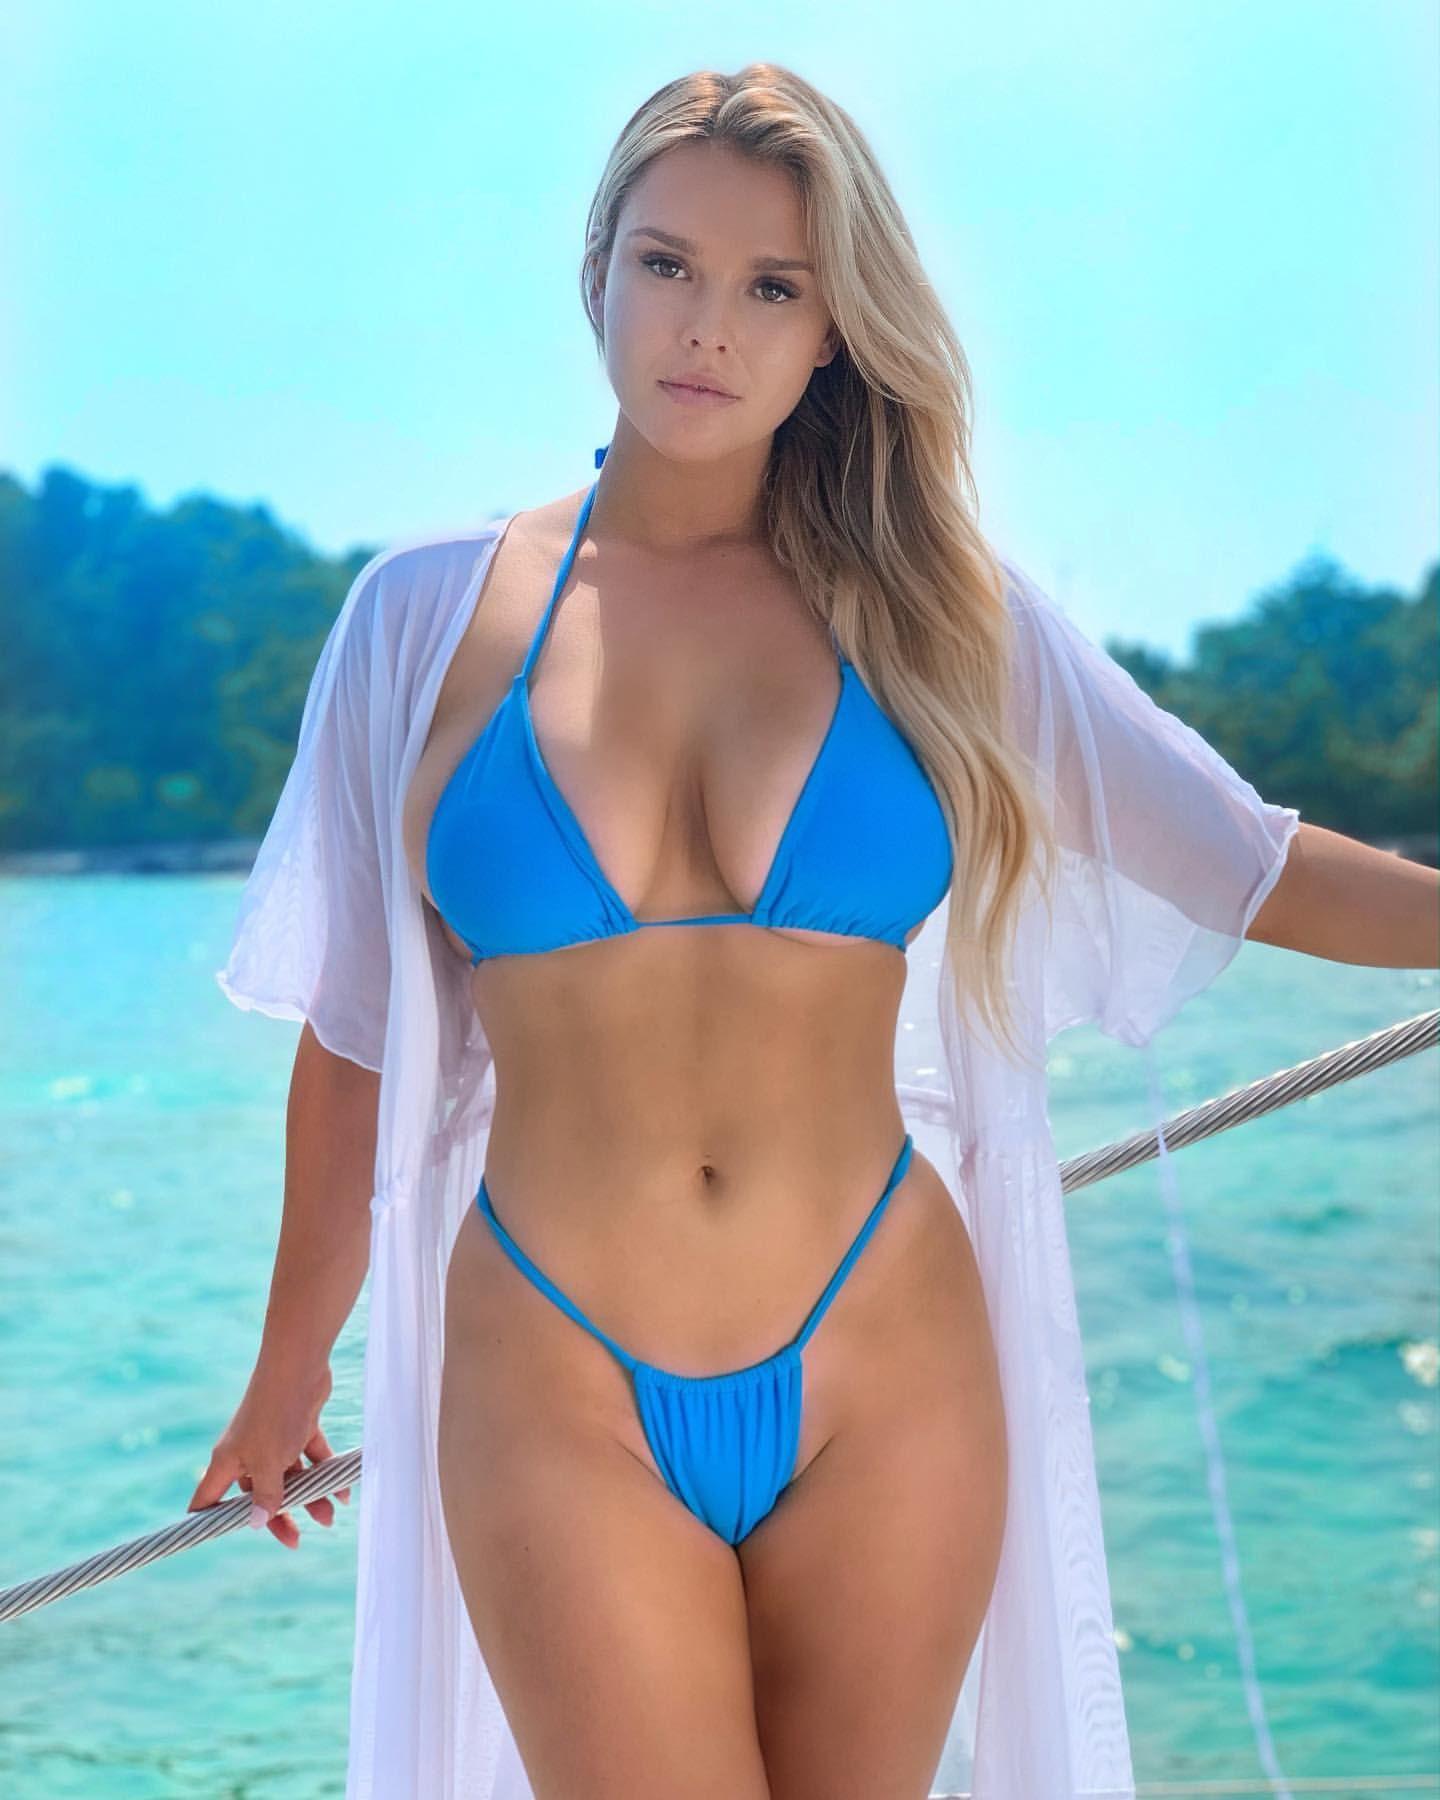 Kinsey Sue En 2021 Chicas En Bikini Fotos En Bikini Fotografía De Lencería